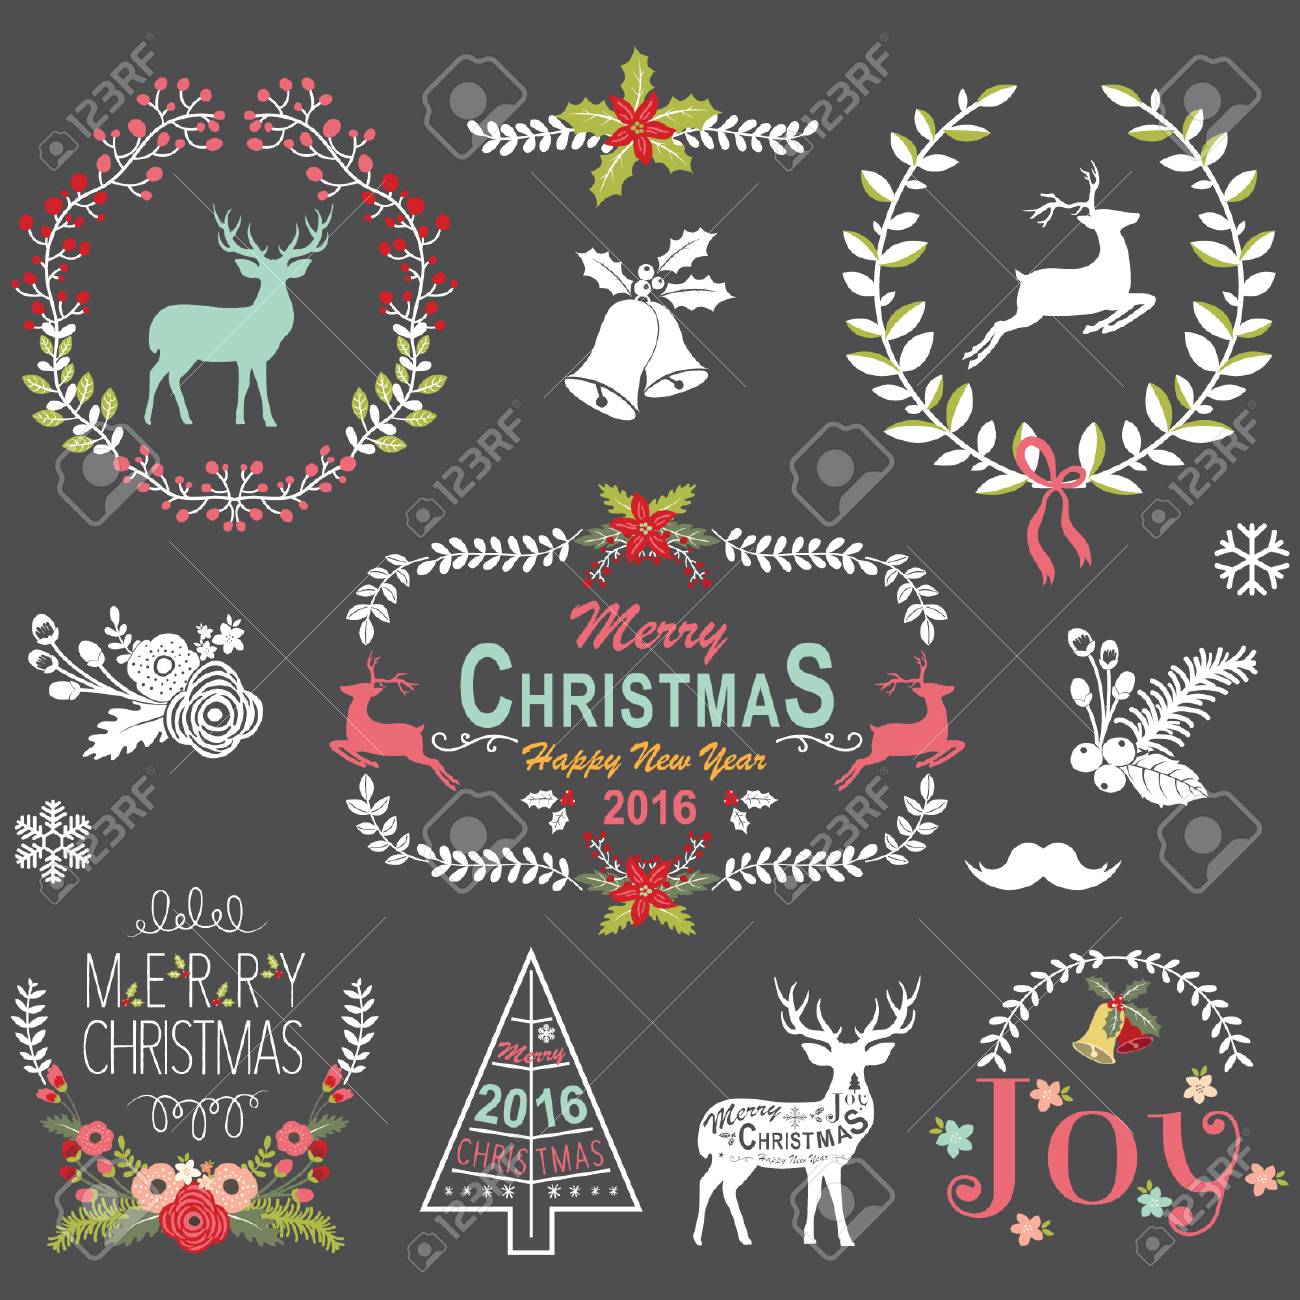 Christmas Chalkboard.Retro Christmas Chalkboard